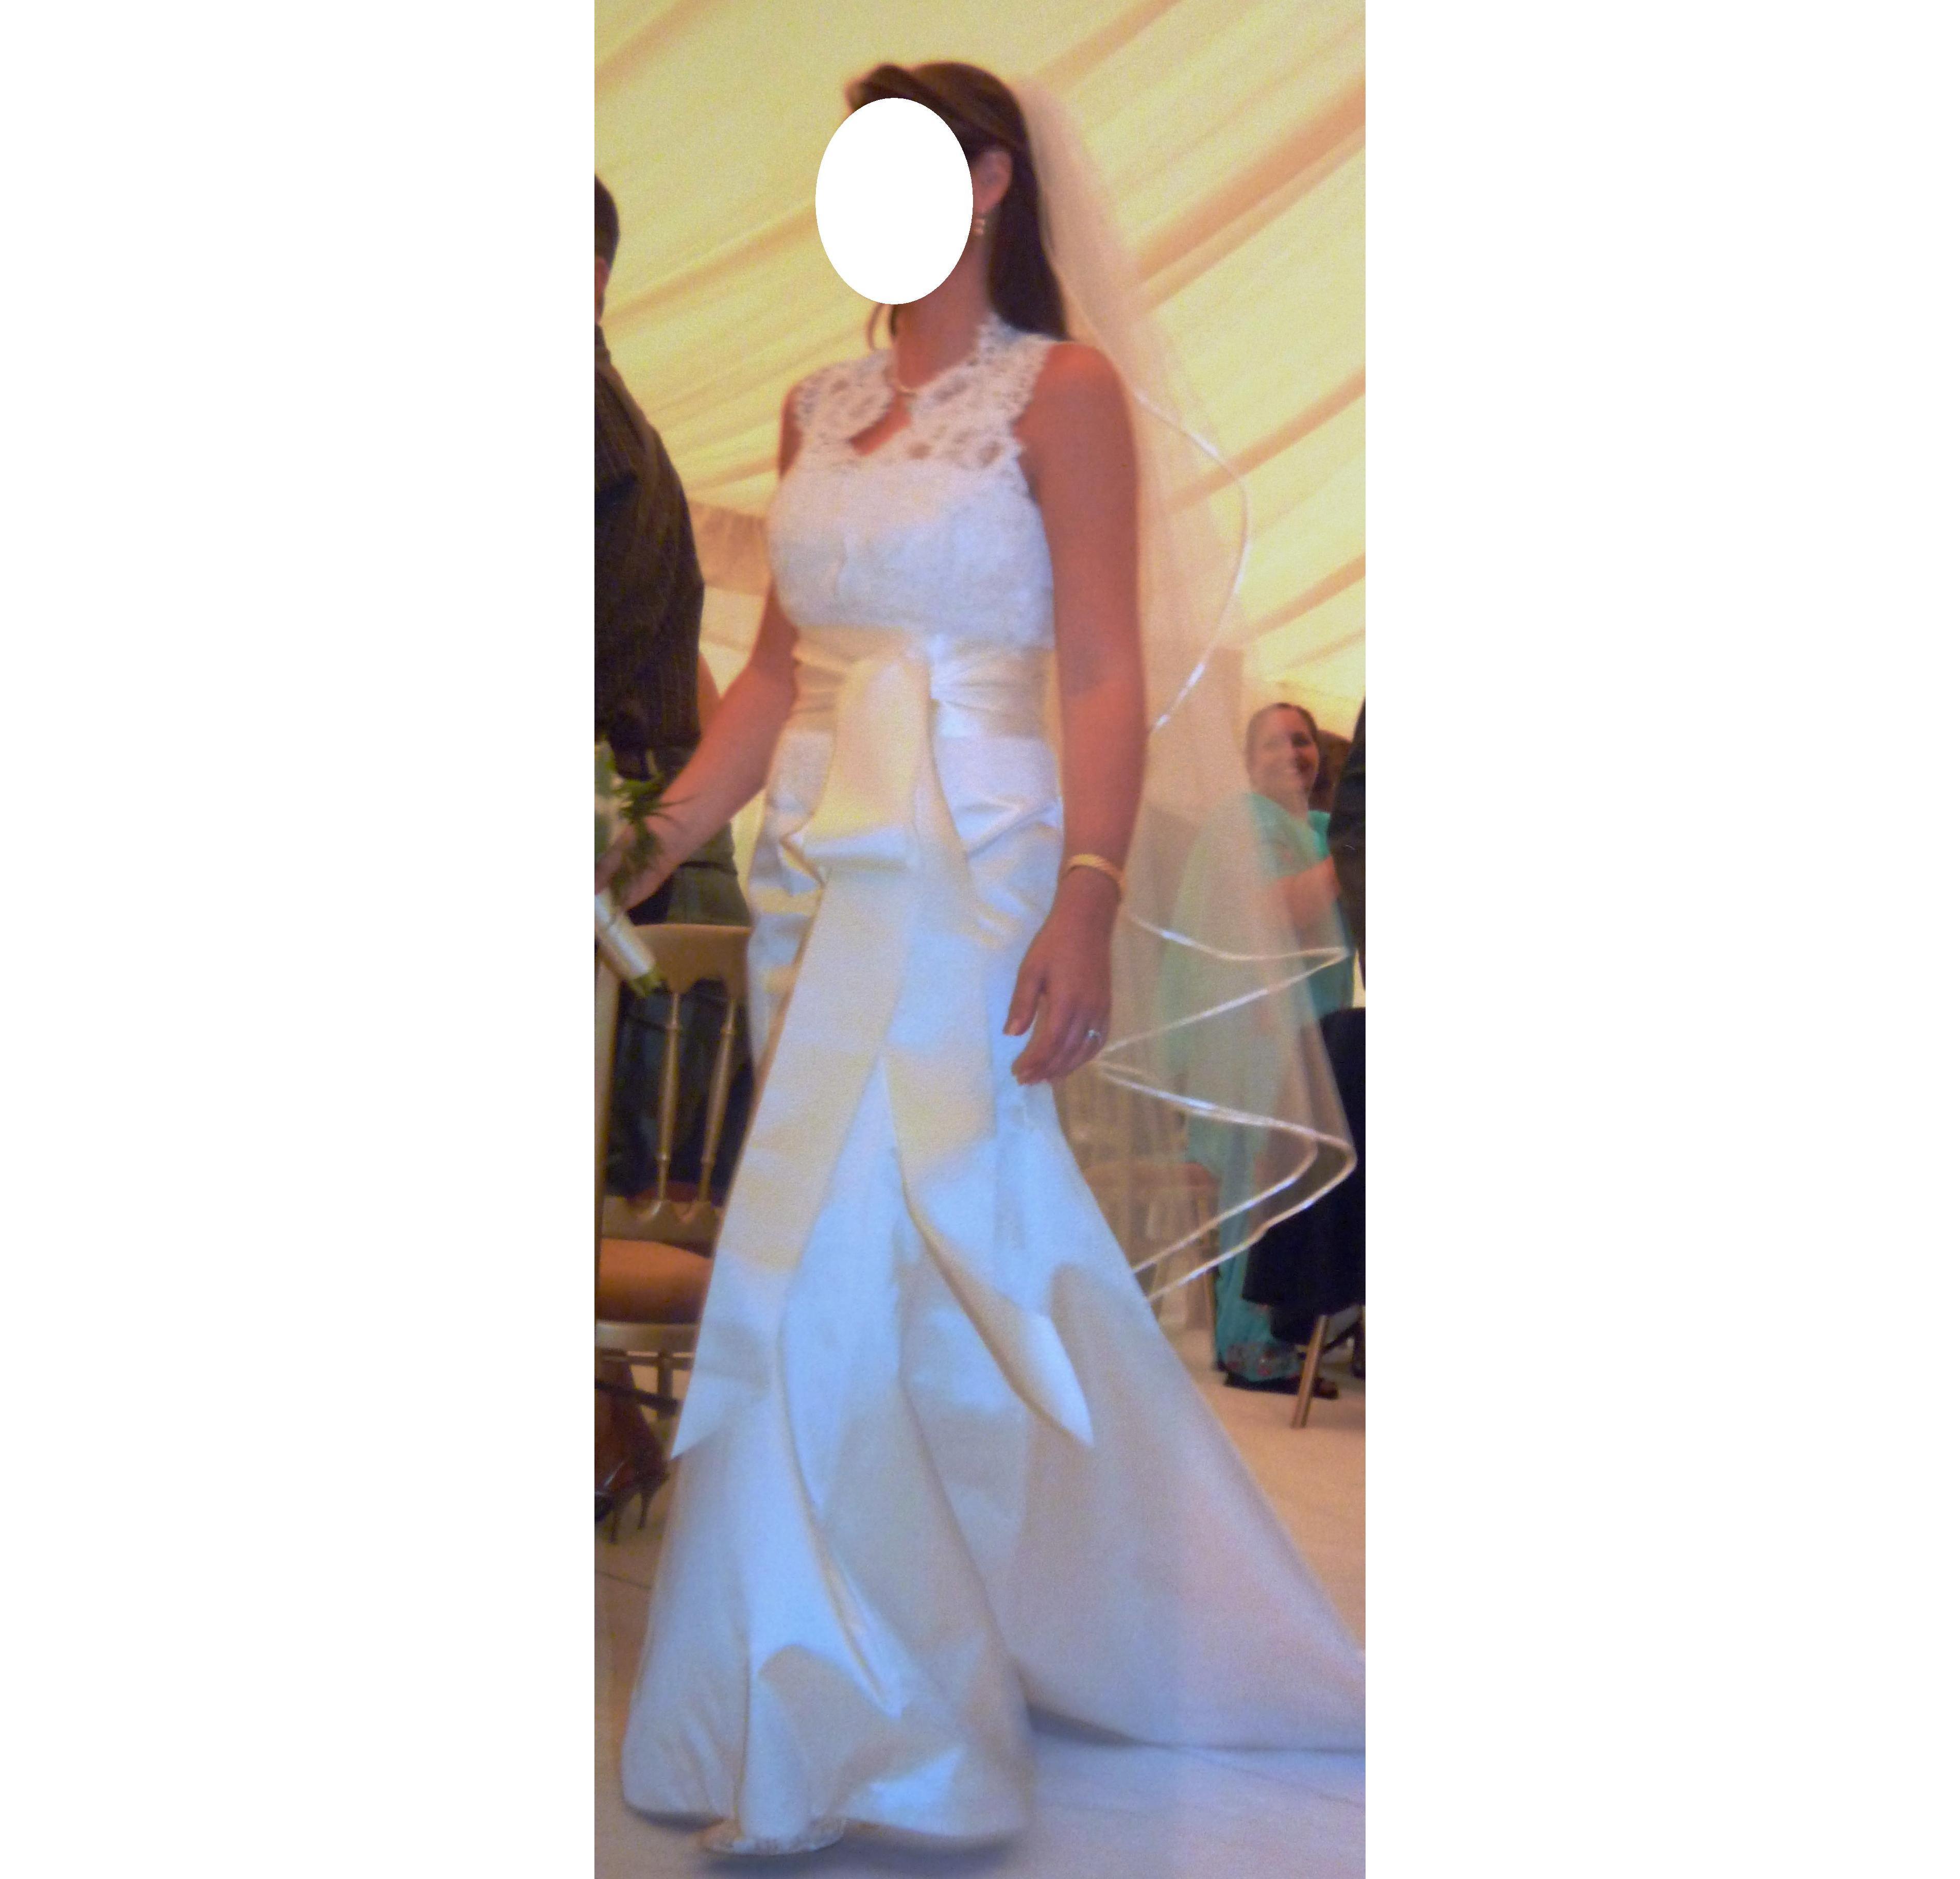 Monique Lhuillier ivory wedding dress, lace top and veil